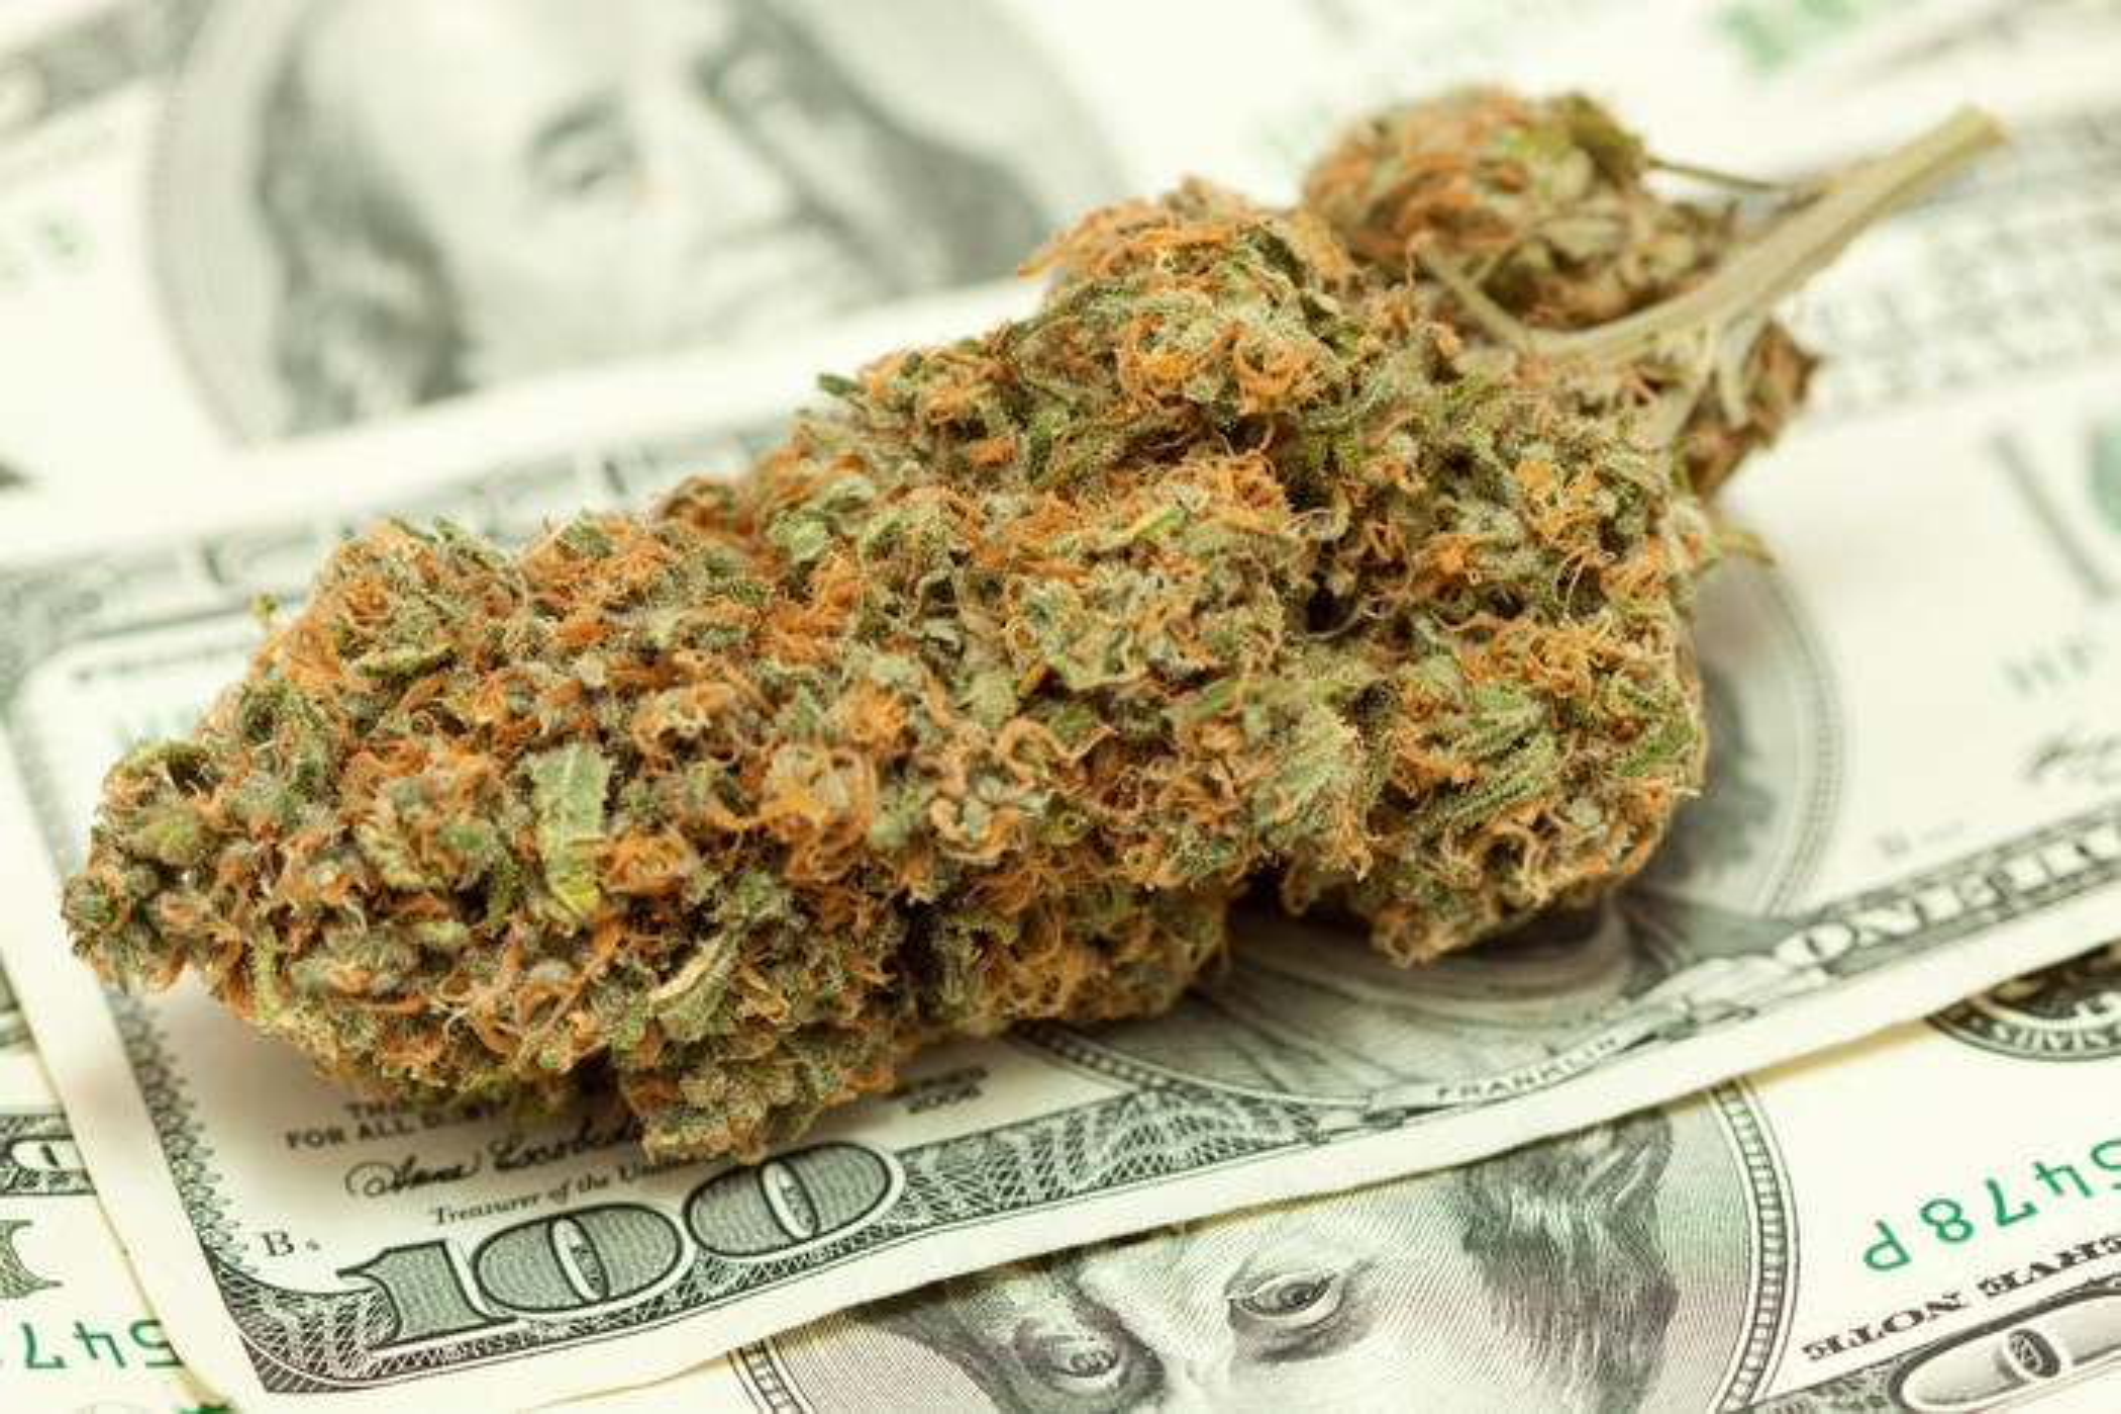 Marijuana bud laying on top of money.